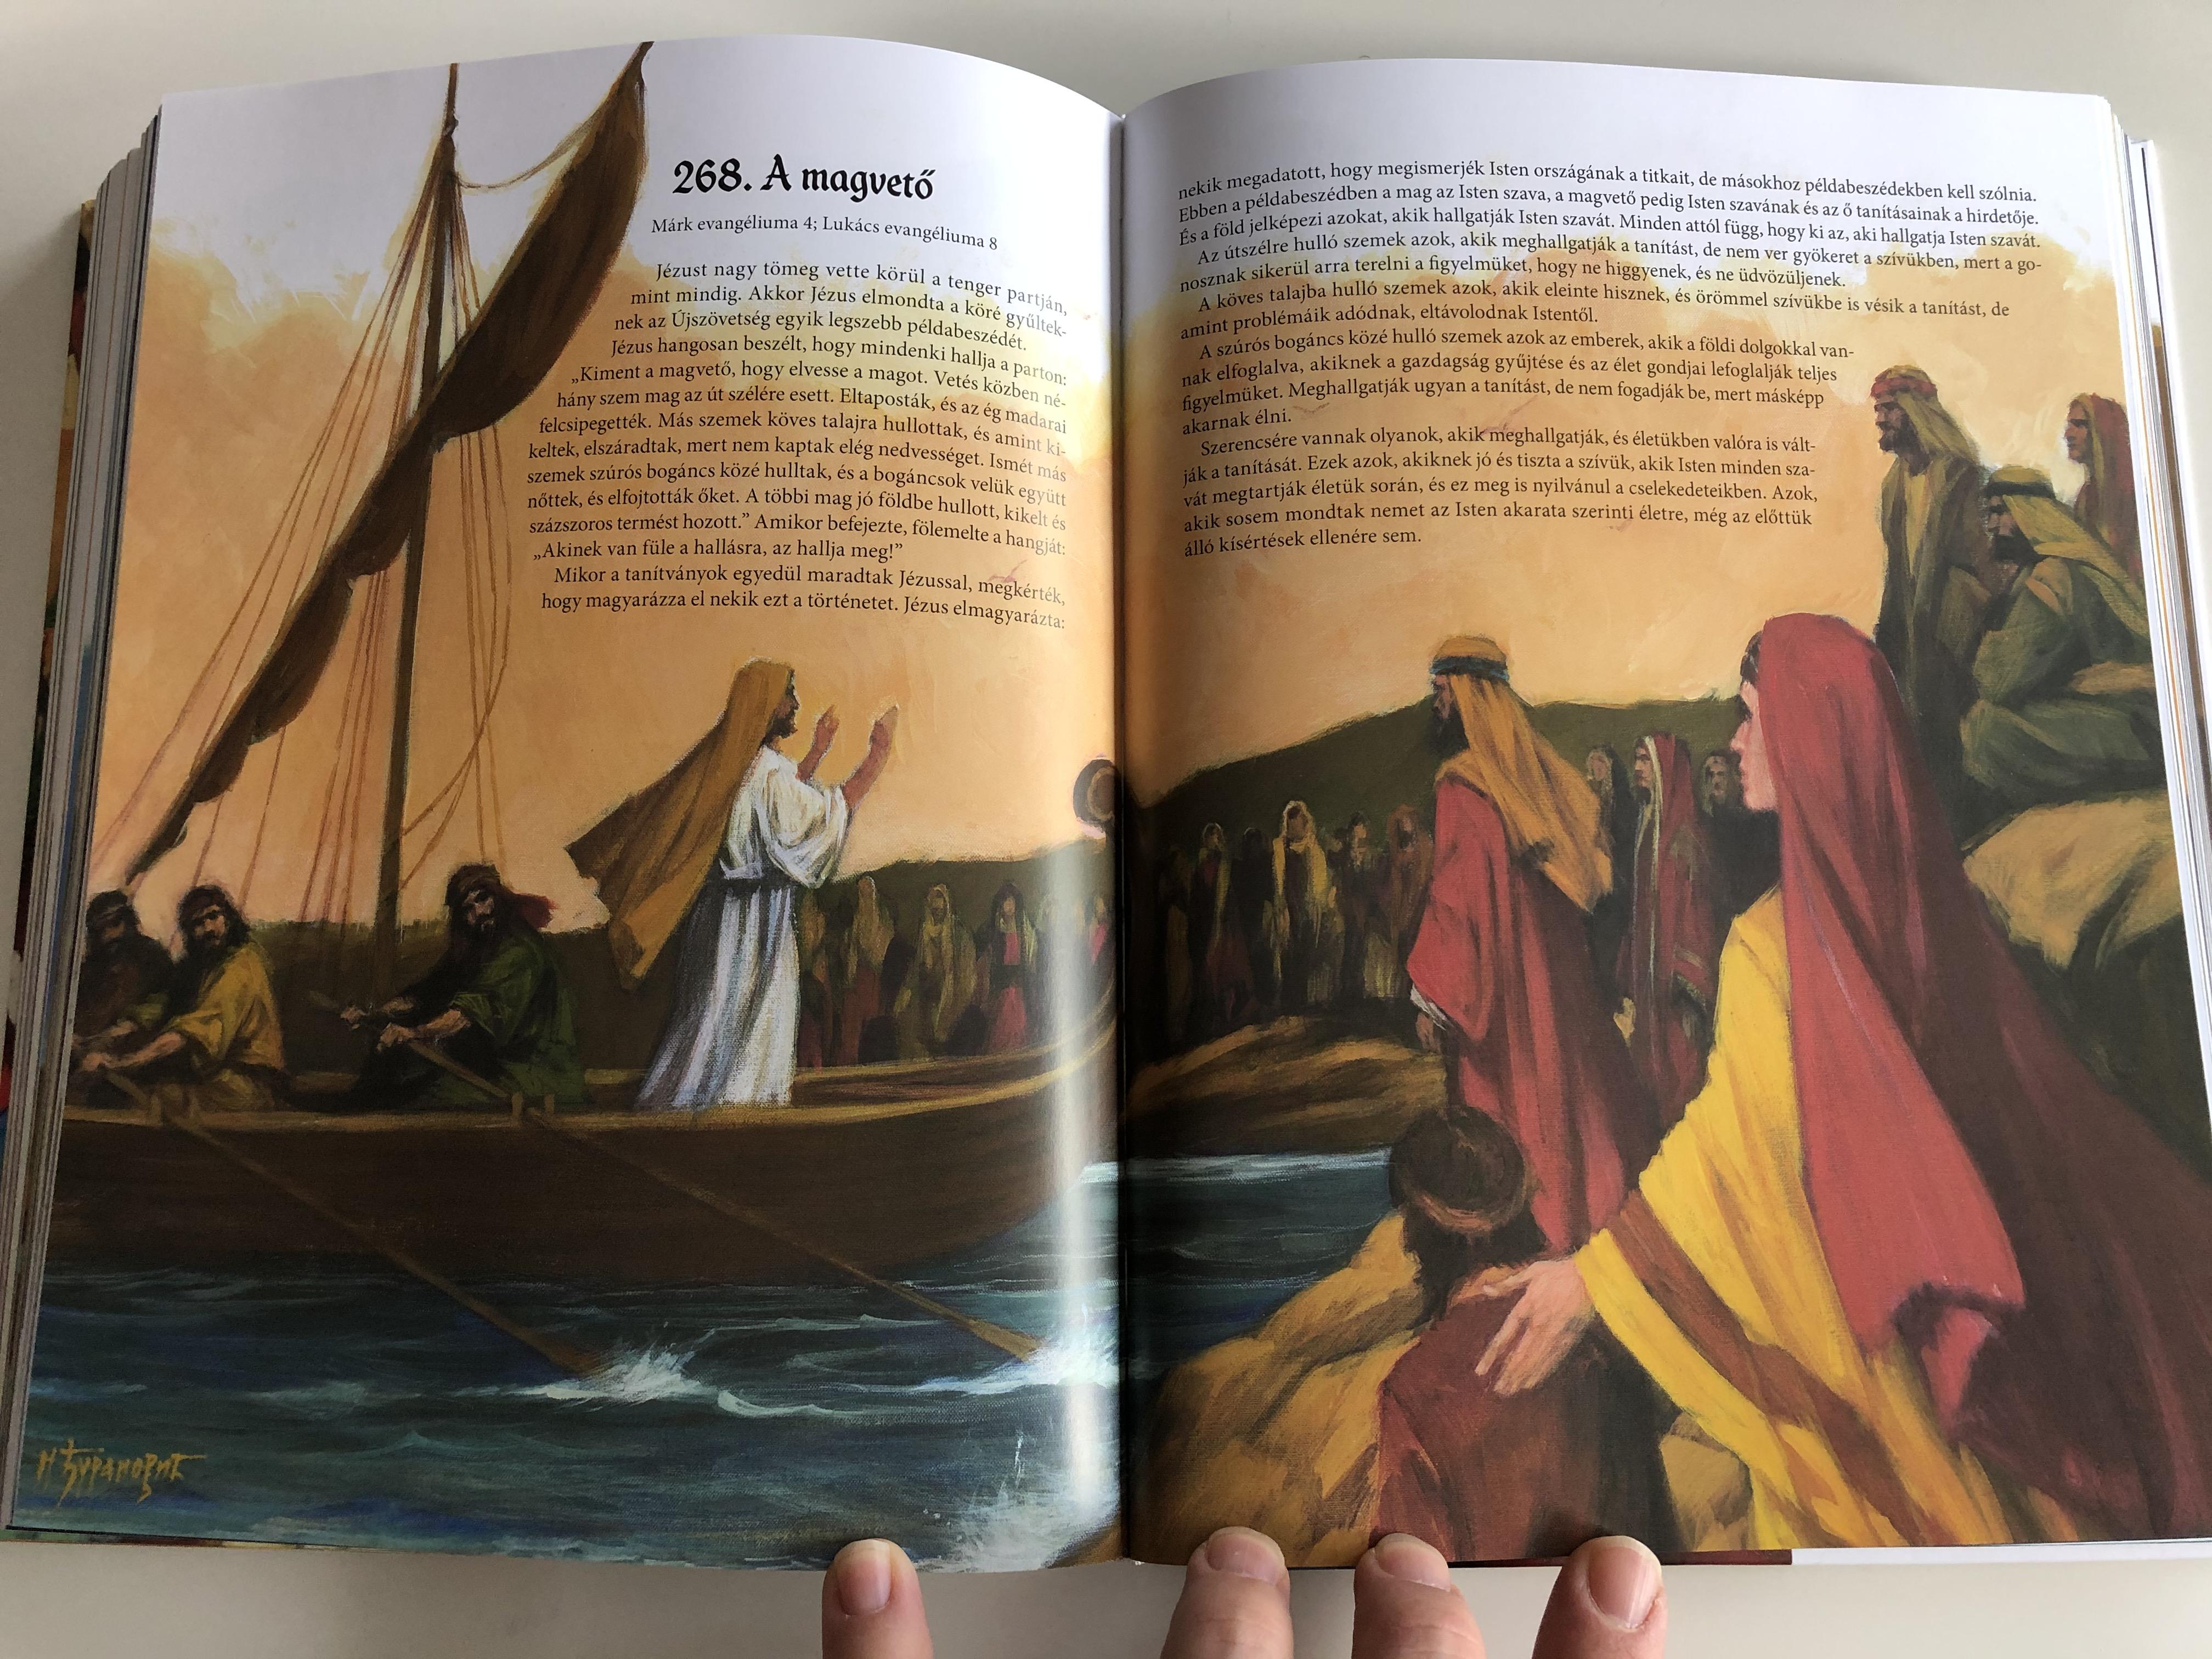 k-pes-biblia-r-k-t-rt-netek-az-s-365-napj-ra-hungarian-language-children-s-bible-stories-for-365-days-11.jpg